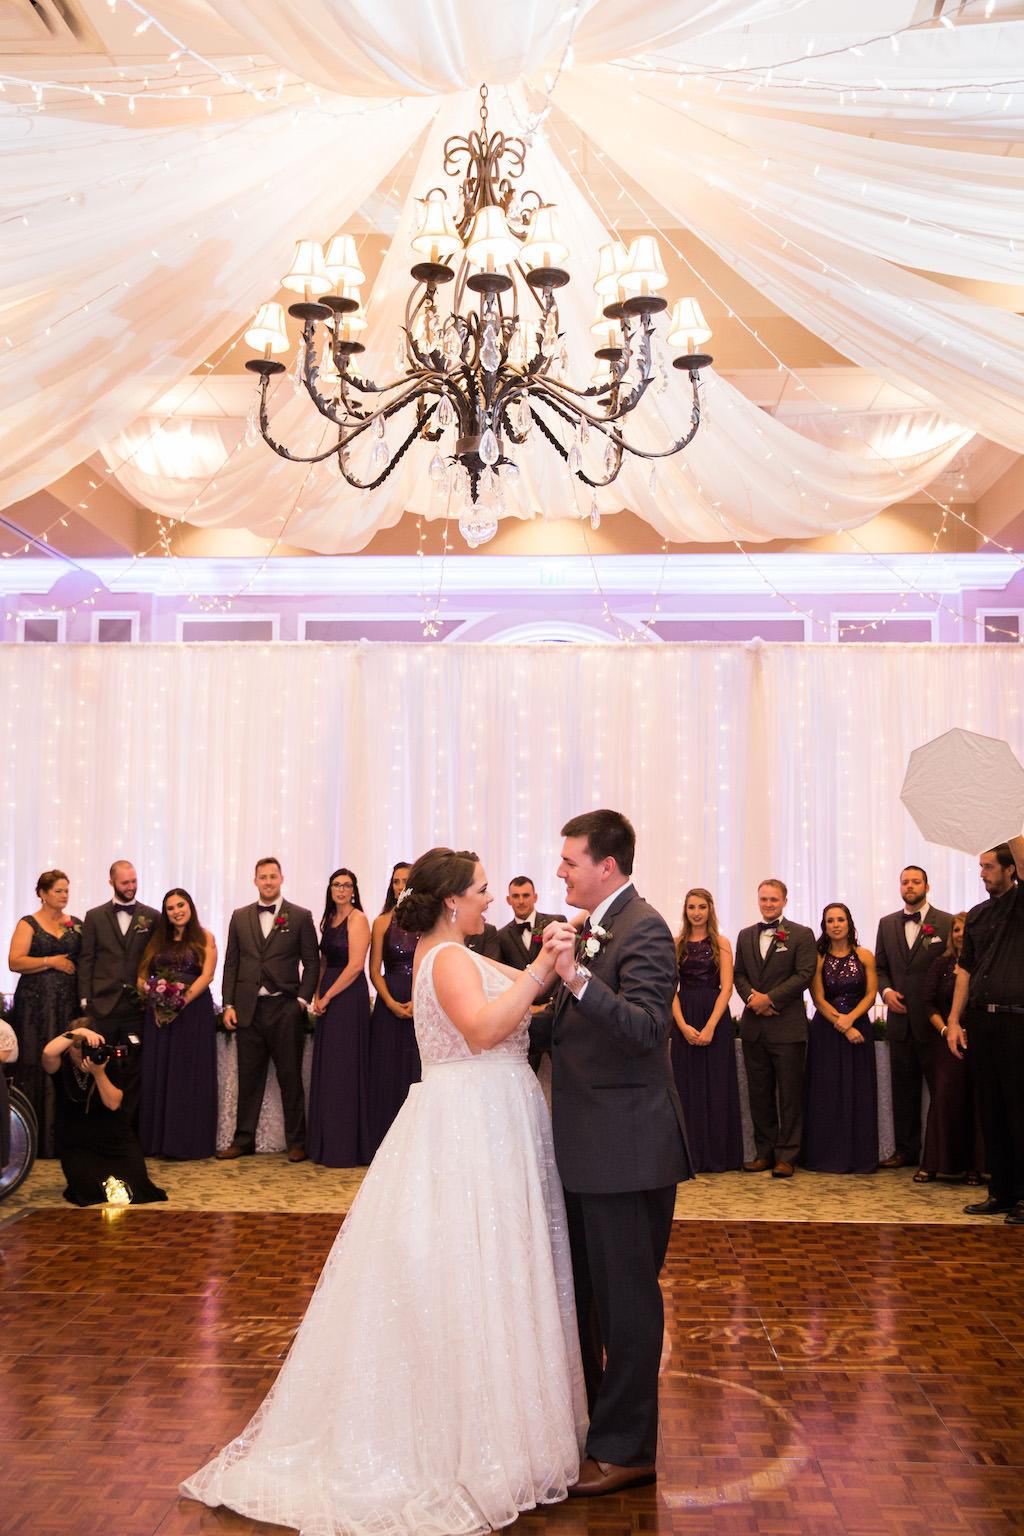 Whimsical Ballroom Wedding Reception First Dance Portrait   Sarasota Wedding DJ Grant Hemond and Associates